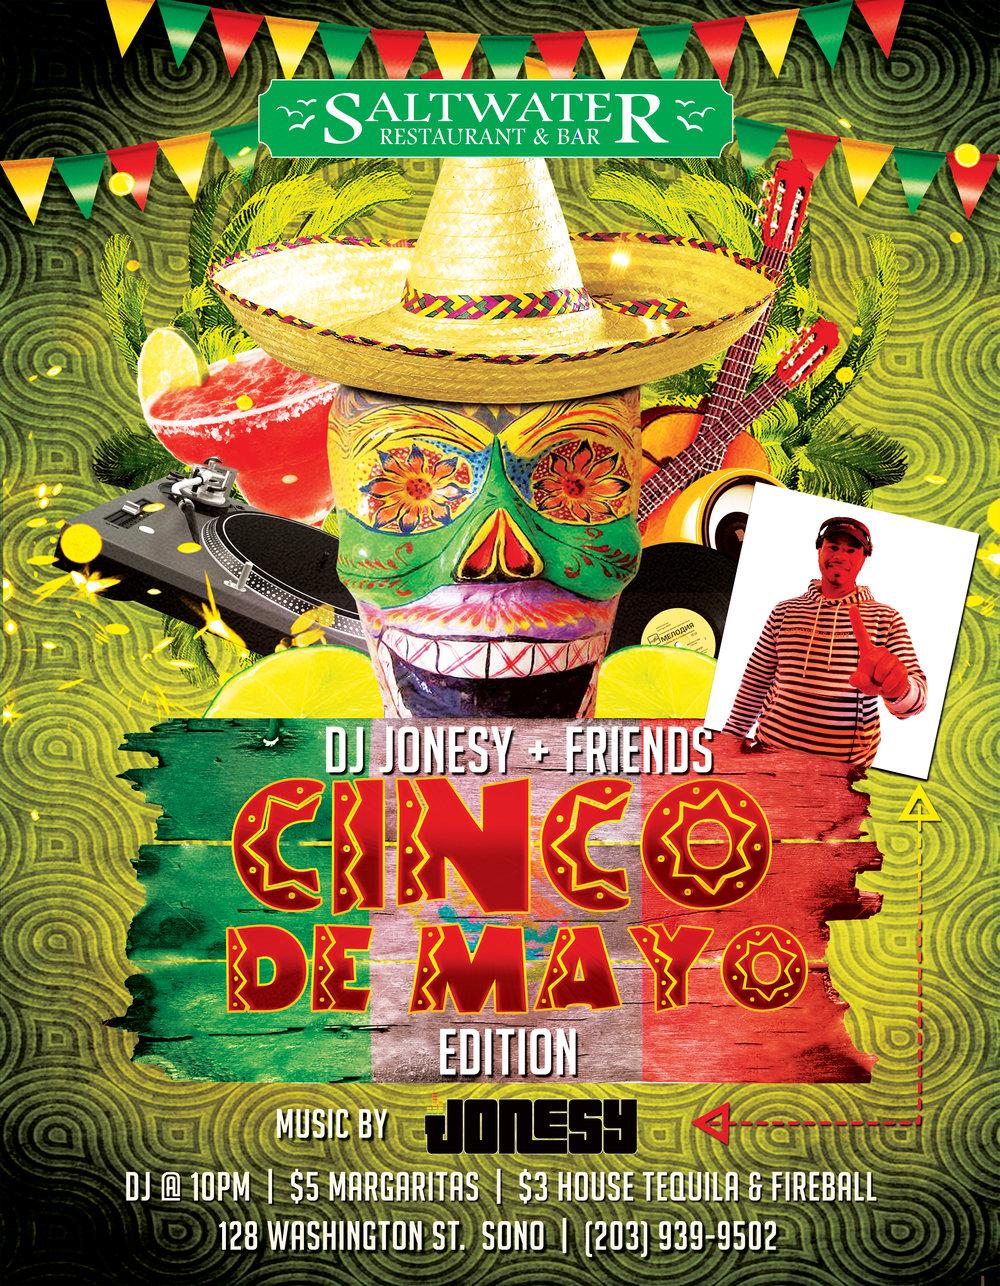 Cinco_de_Mayo_Party-saltwater-jonesy.jpg